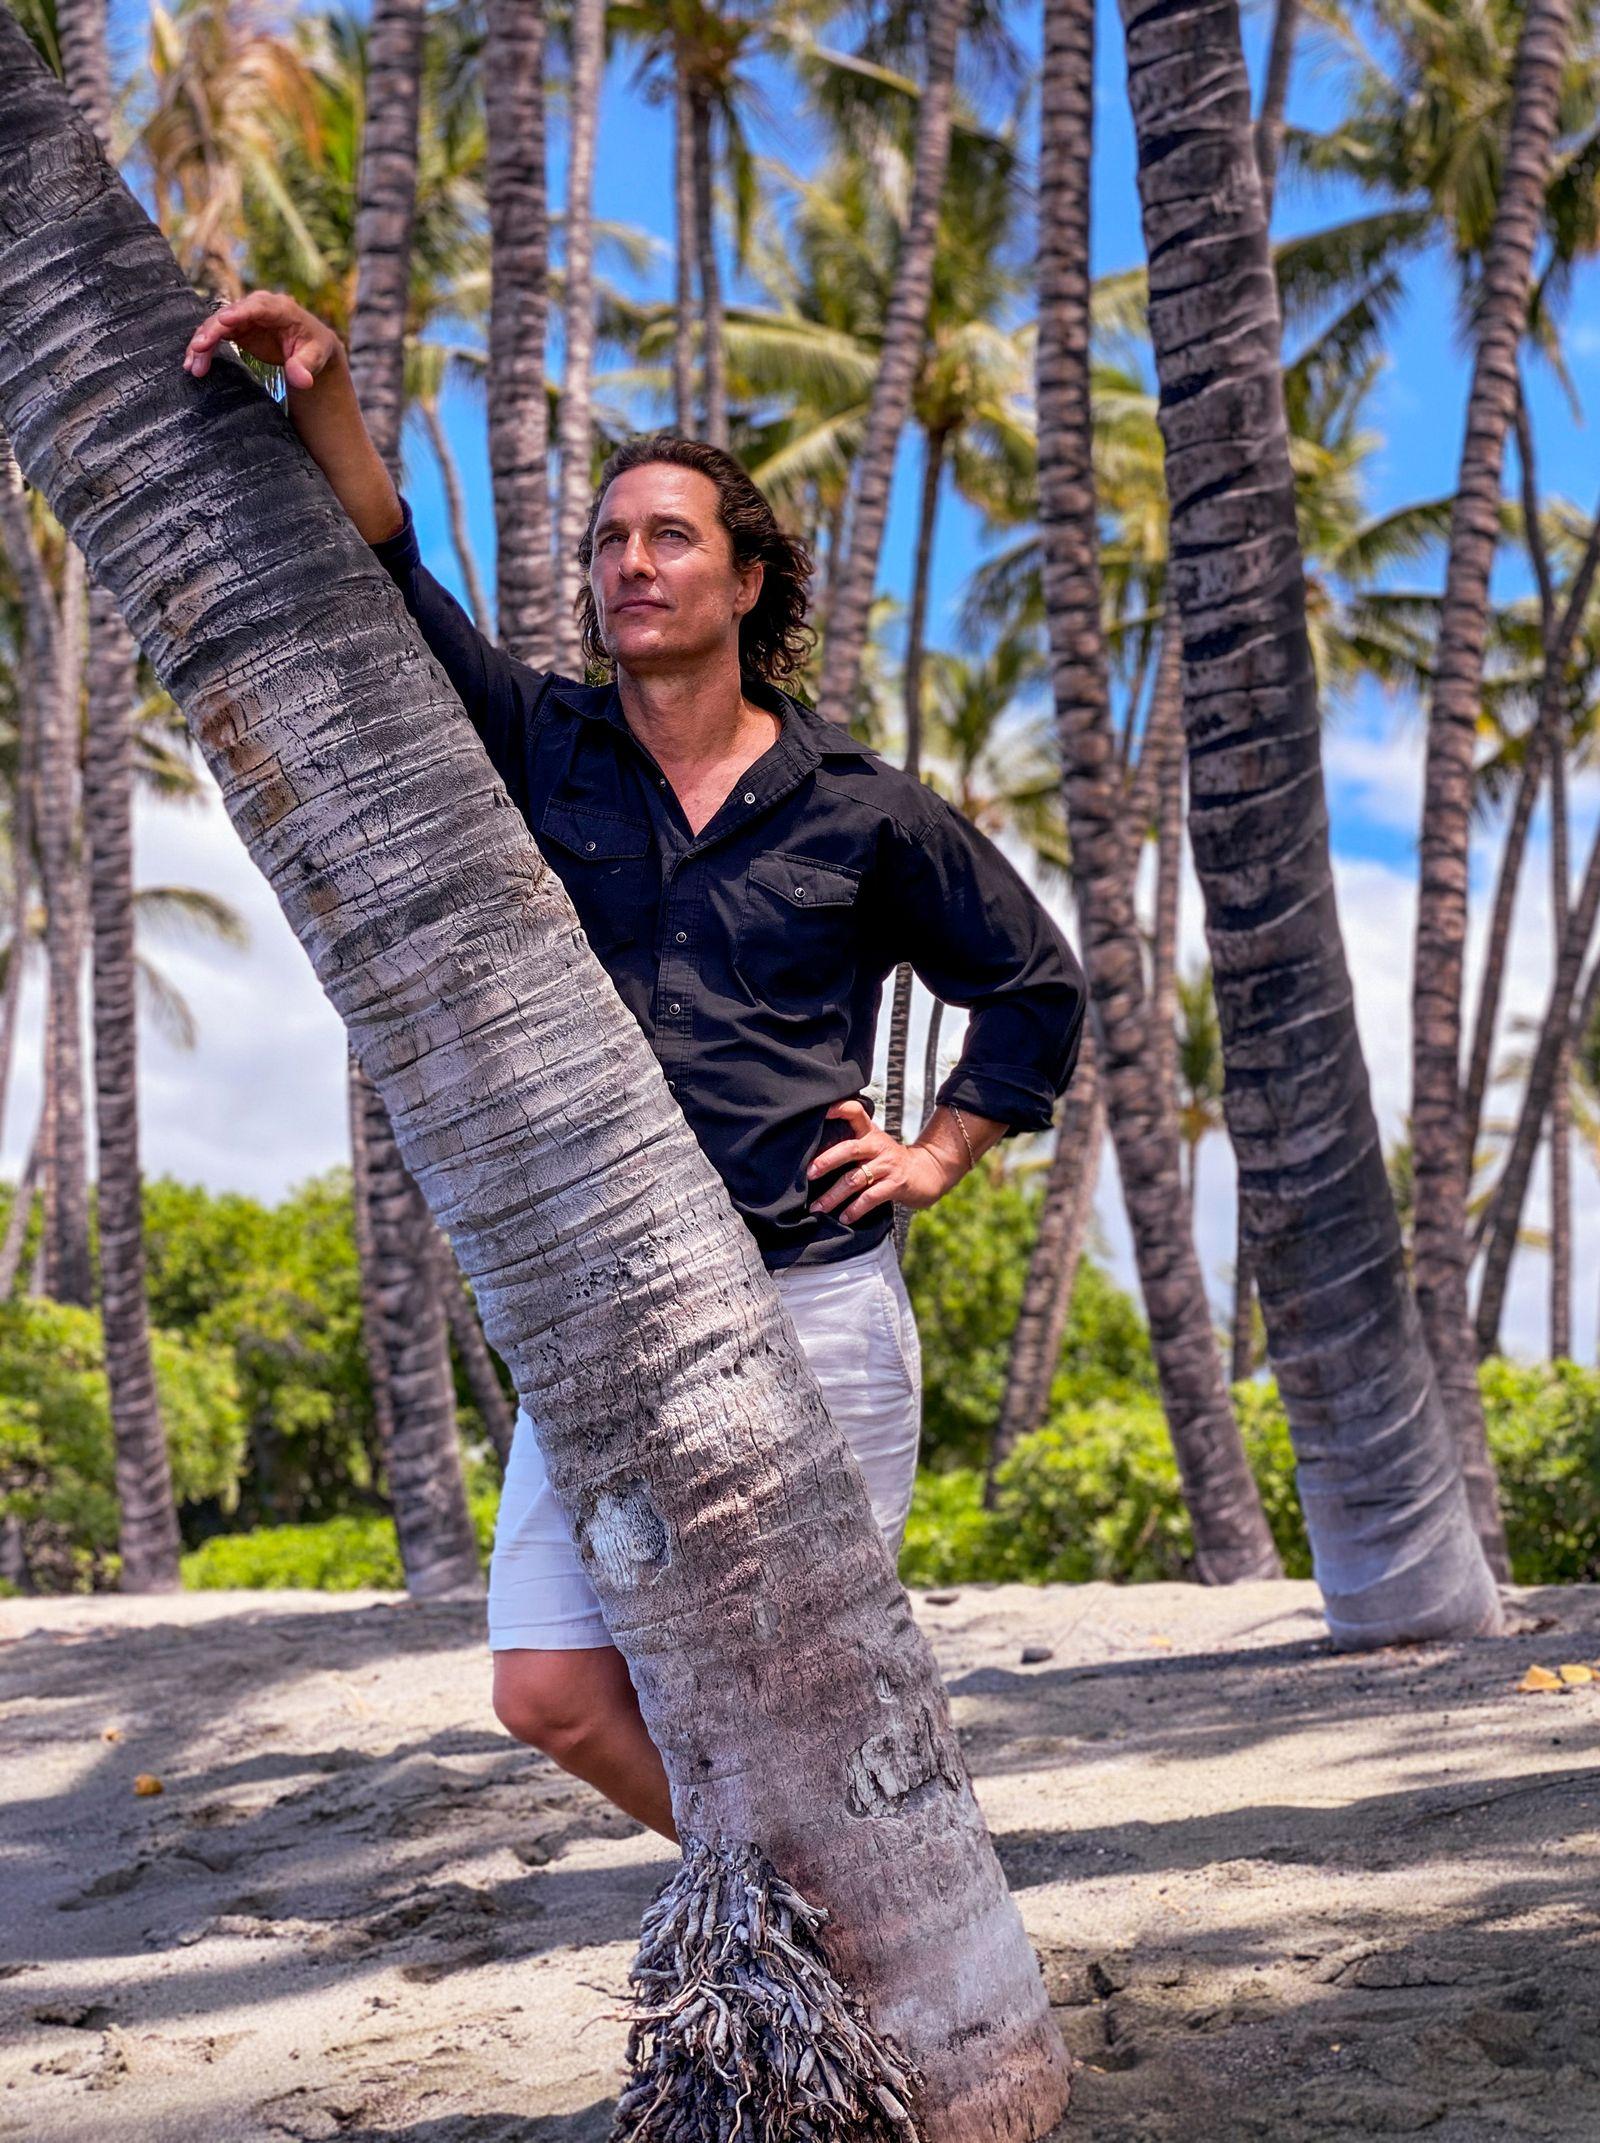 Matthew McConaughey photographed remotely, Sept. 14, 2020. (Devin Oktar Yalkin/The New York Times)